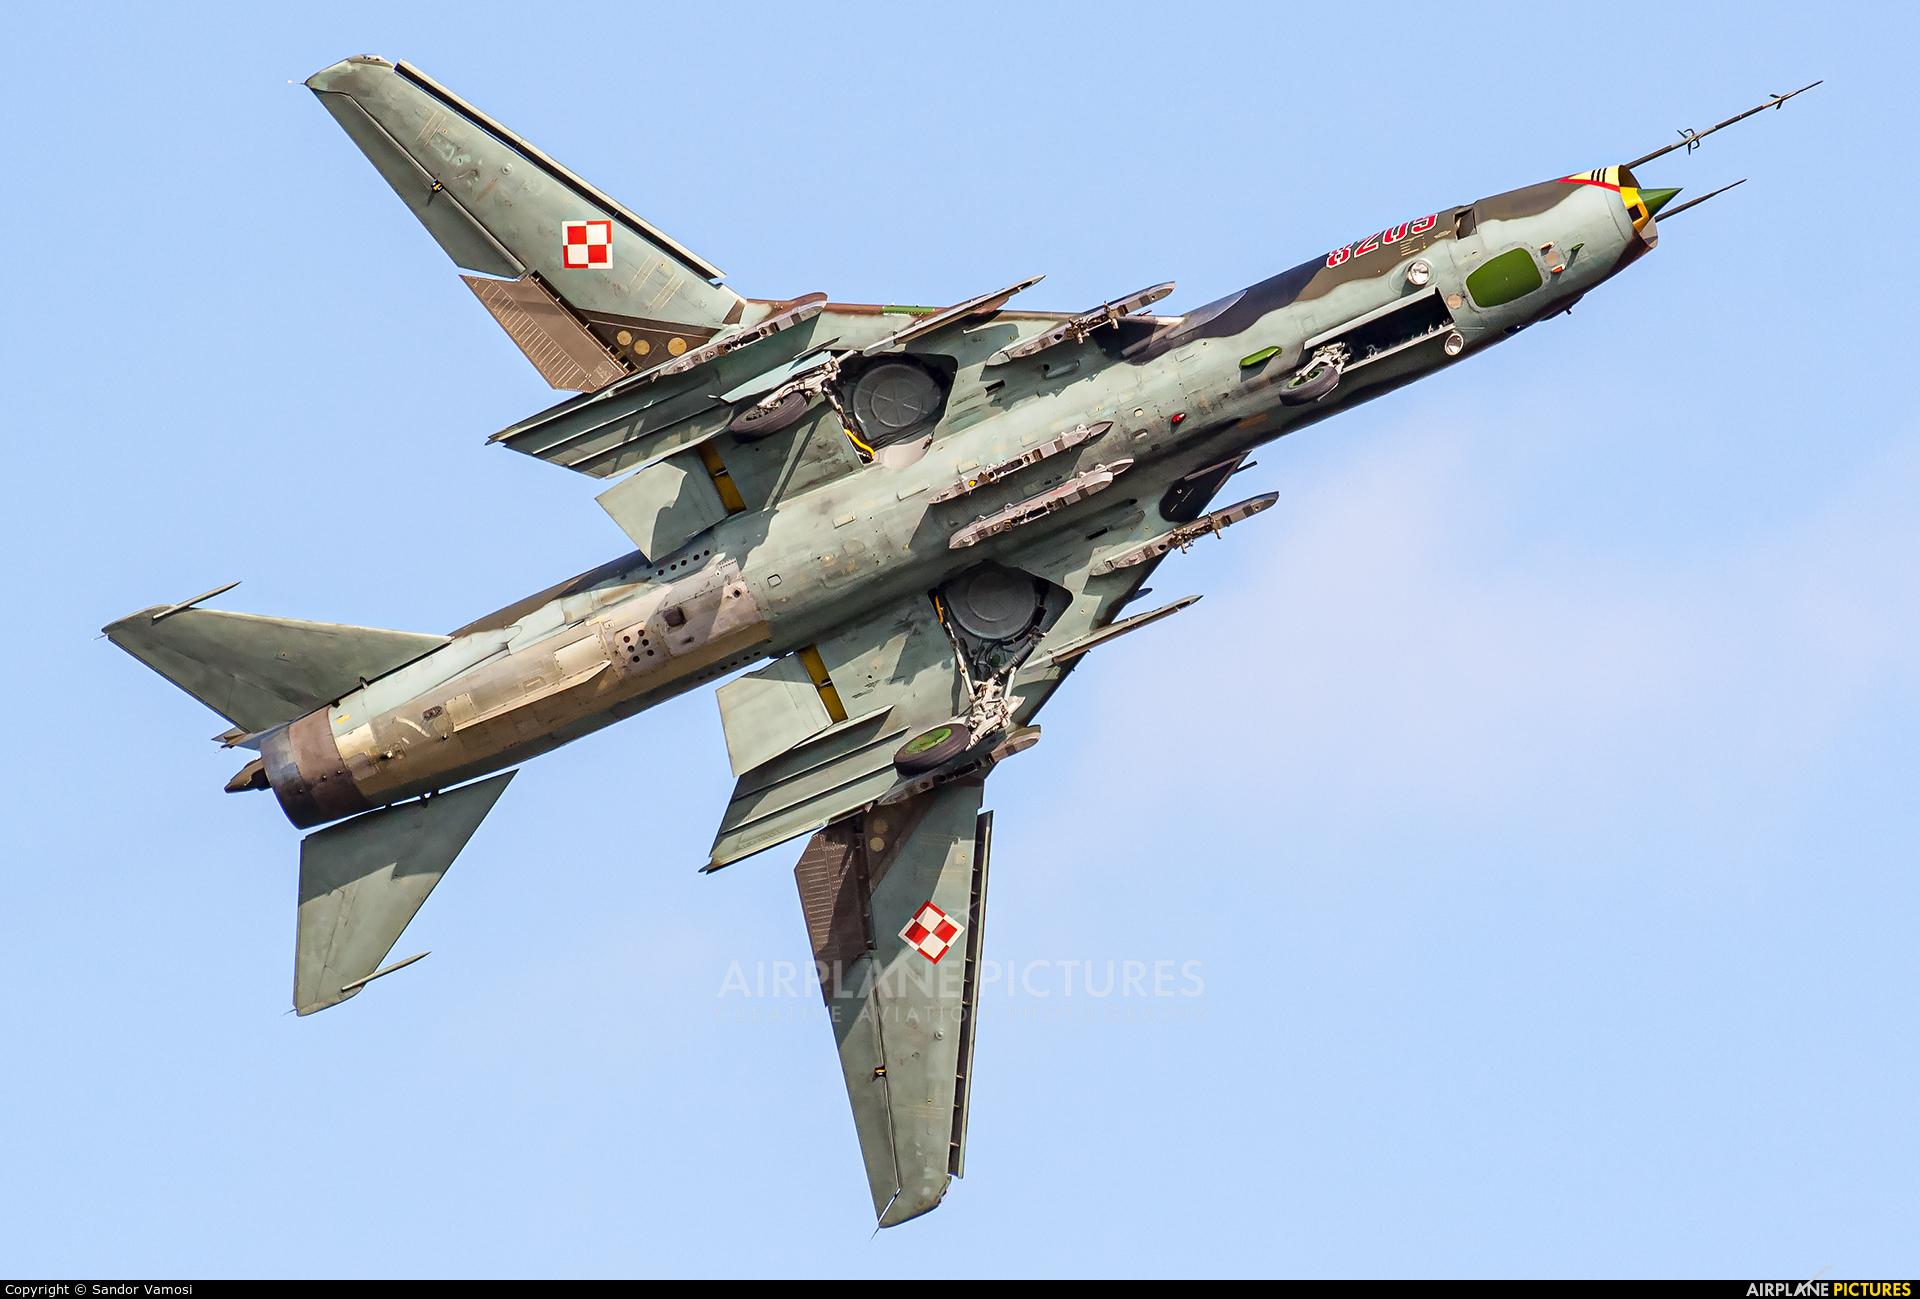 Poland - Air Force 8505 aircraft at Radom - Sadków